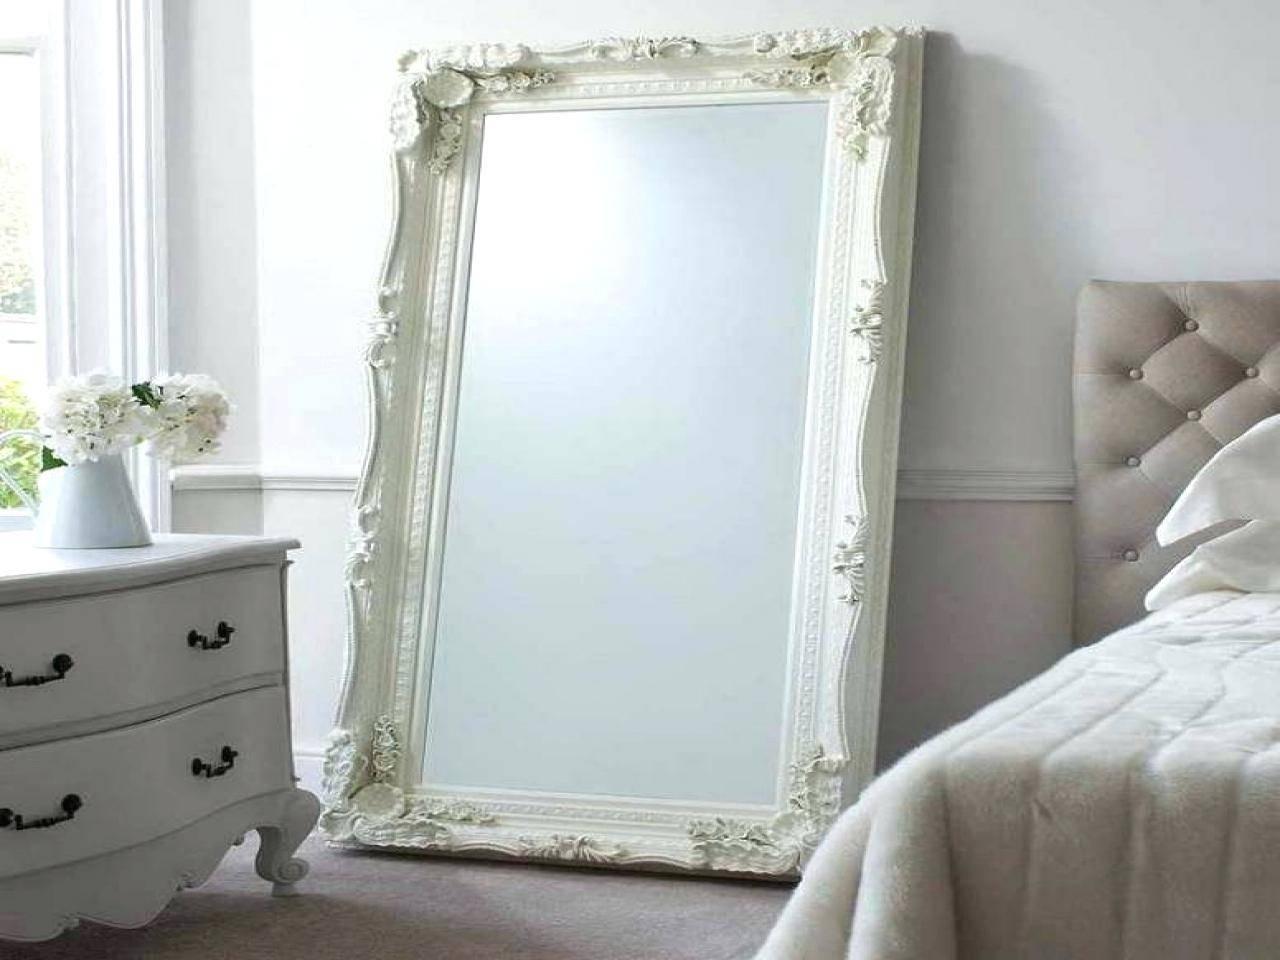 Modrest Beth Modern Walnut Floor Mirrorfloor Mirrors For Bedroom Within Long Vintage Mirrors (View 12 of 15)